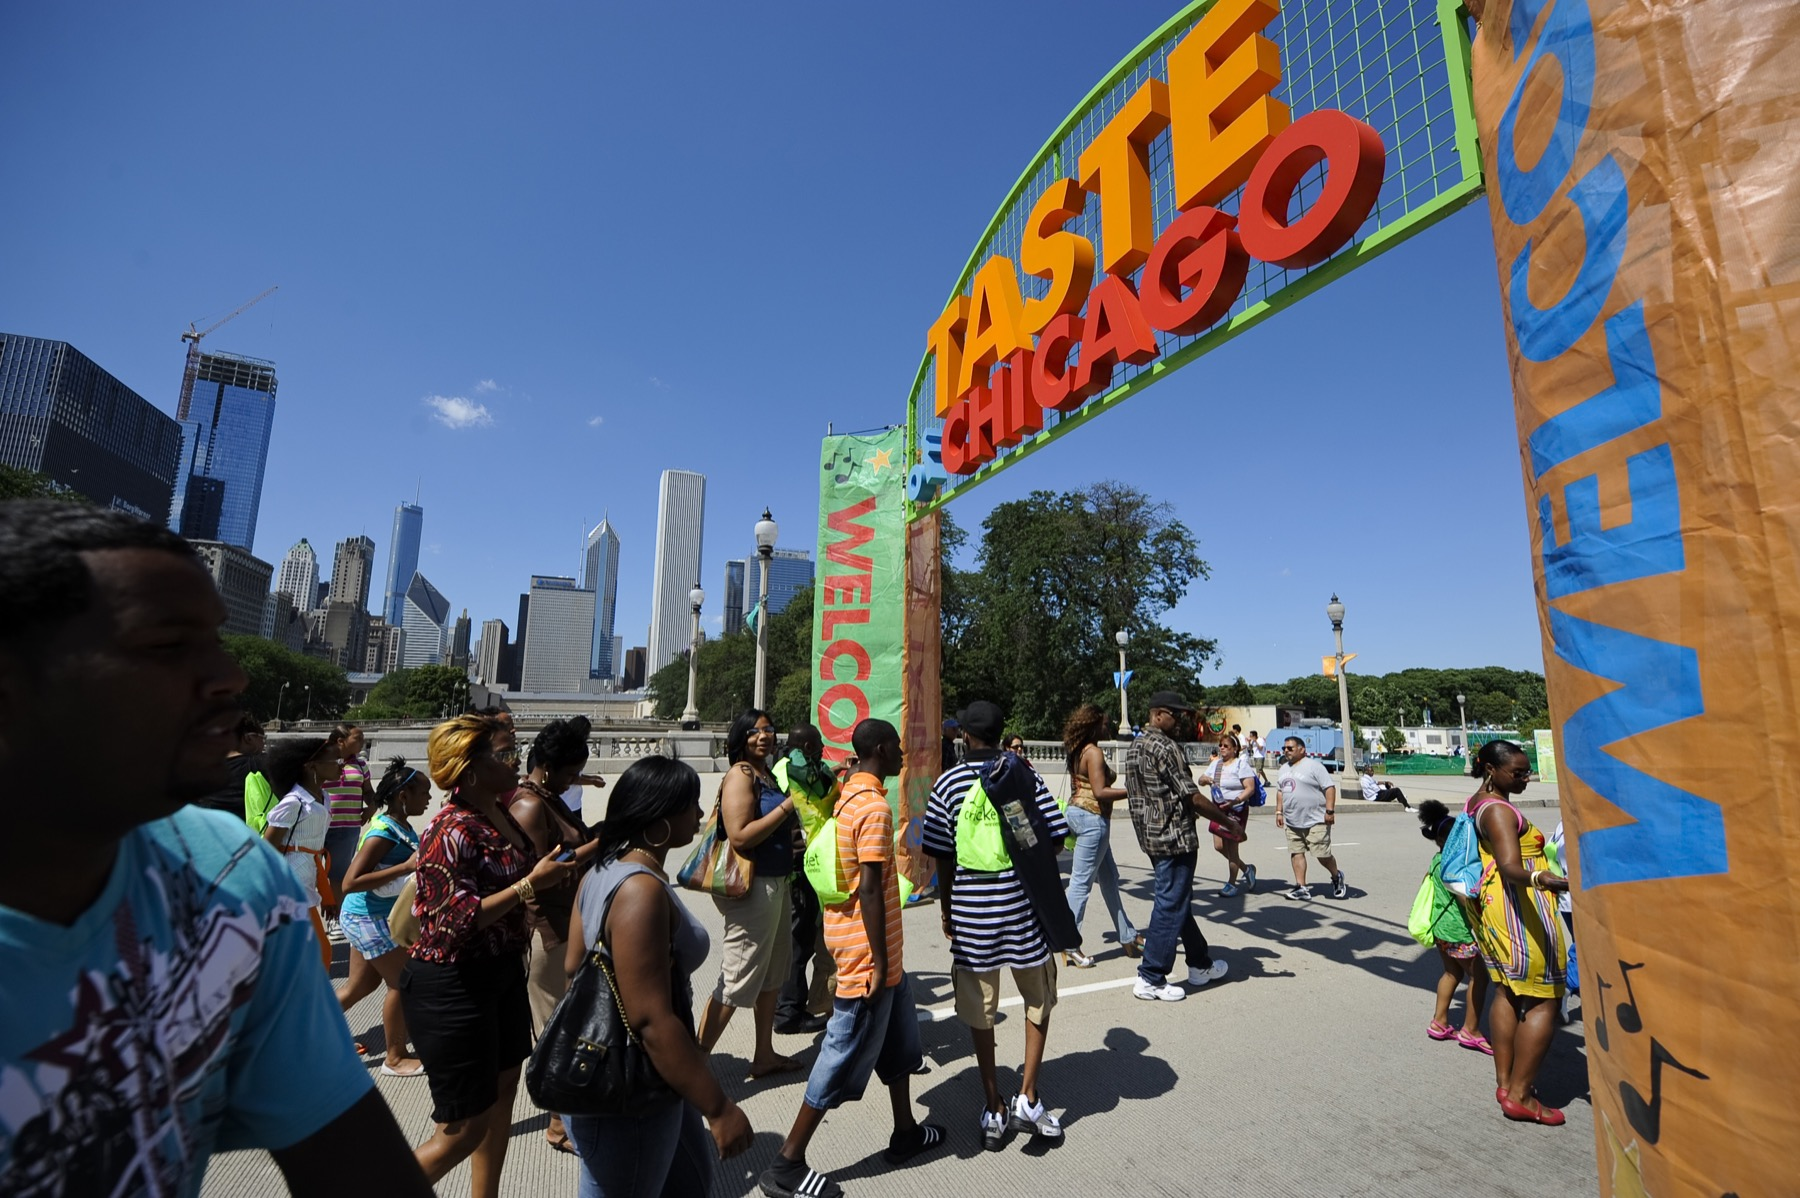 Taste of Chicago Entrance